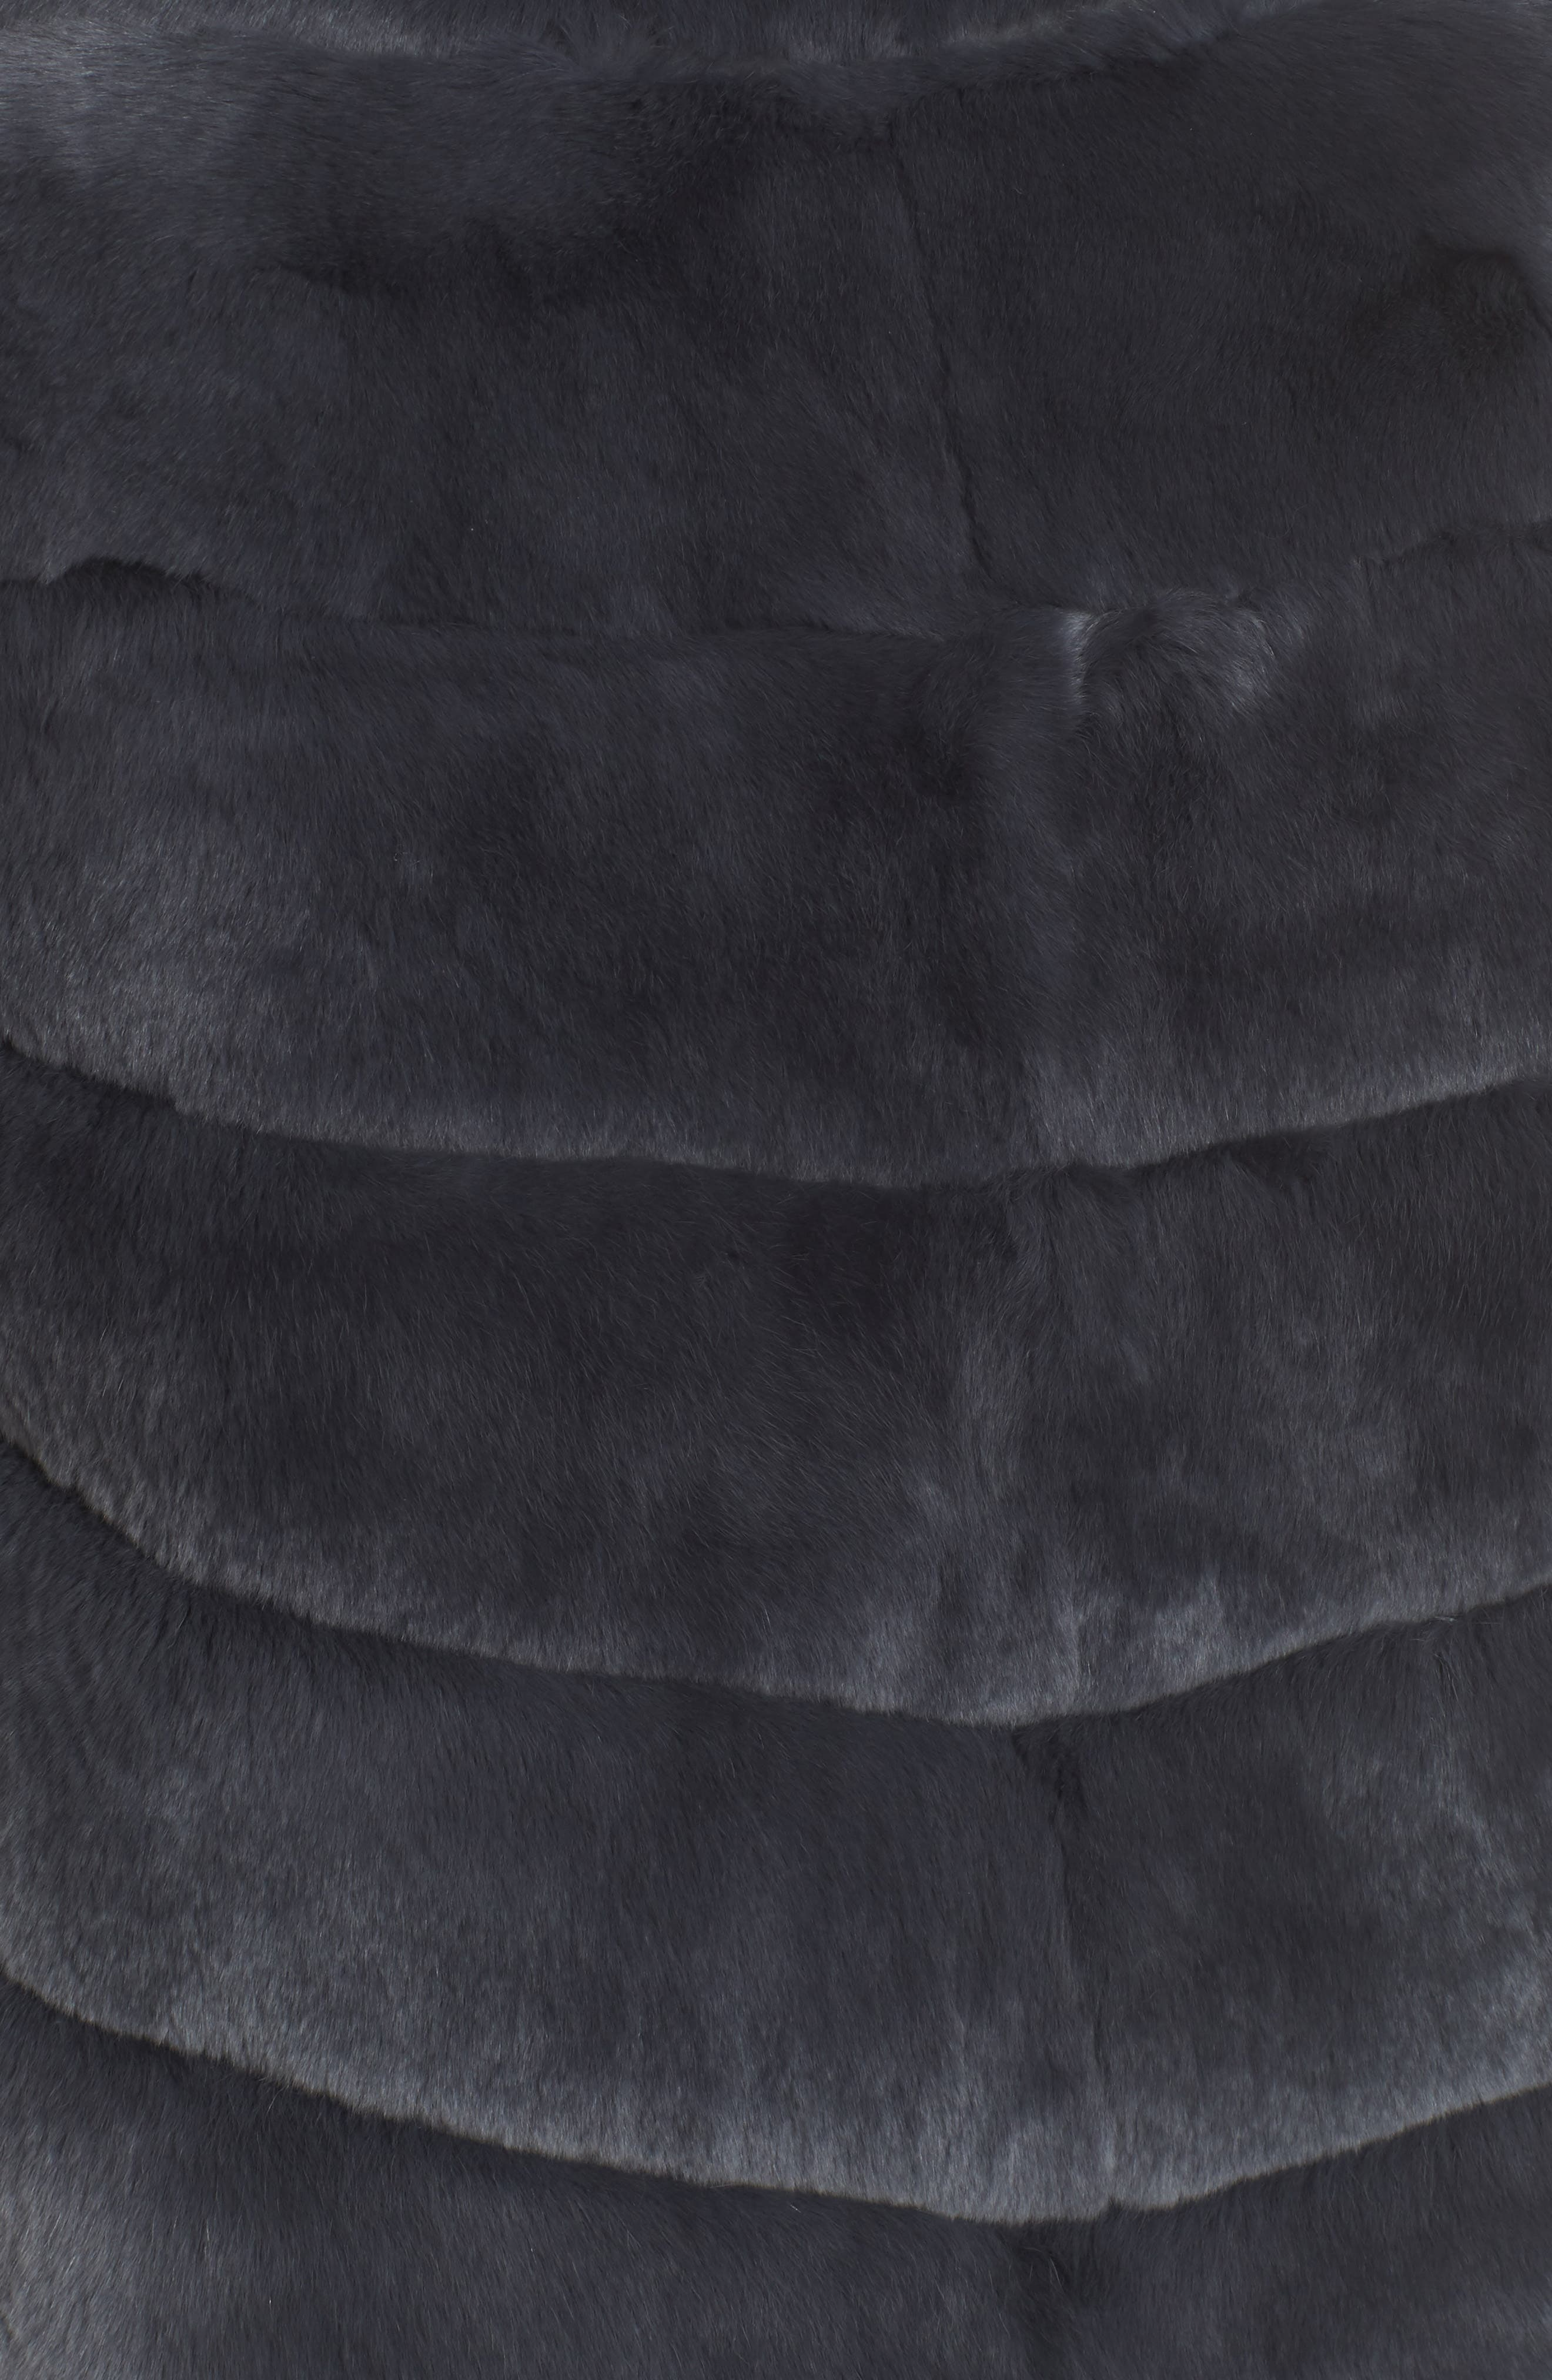 Reversible Genuine Rabbit Fur Vest,                             Alternate thumbnail 6, color,                             410